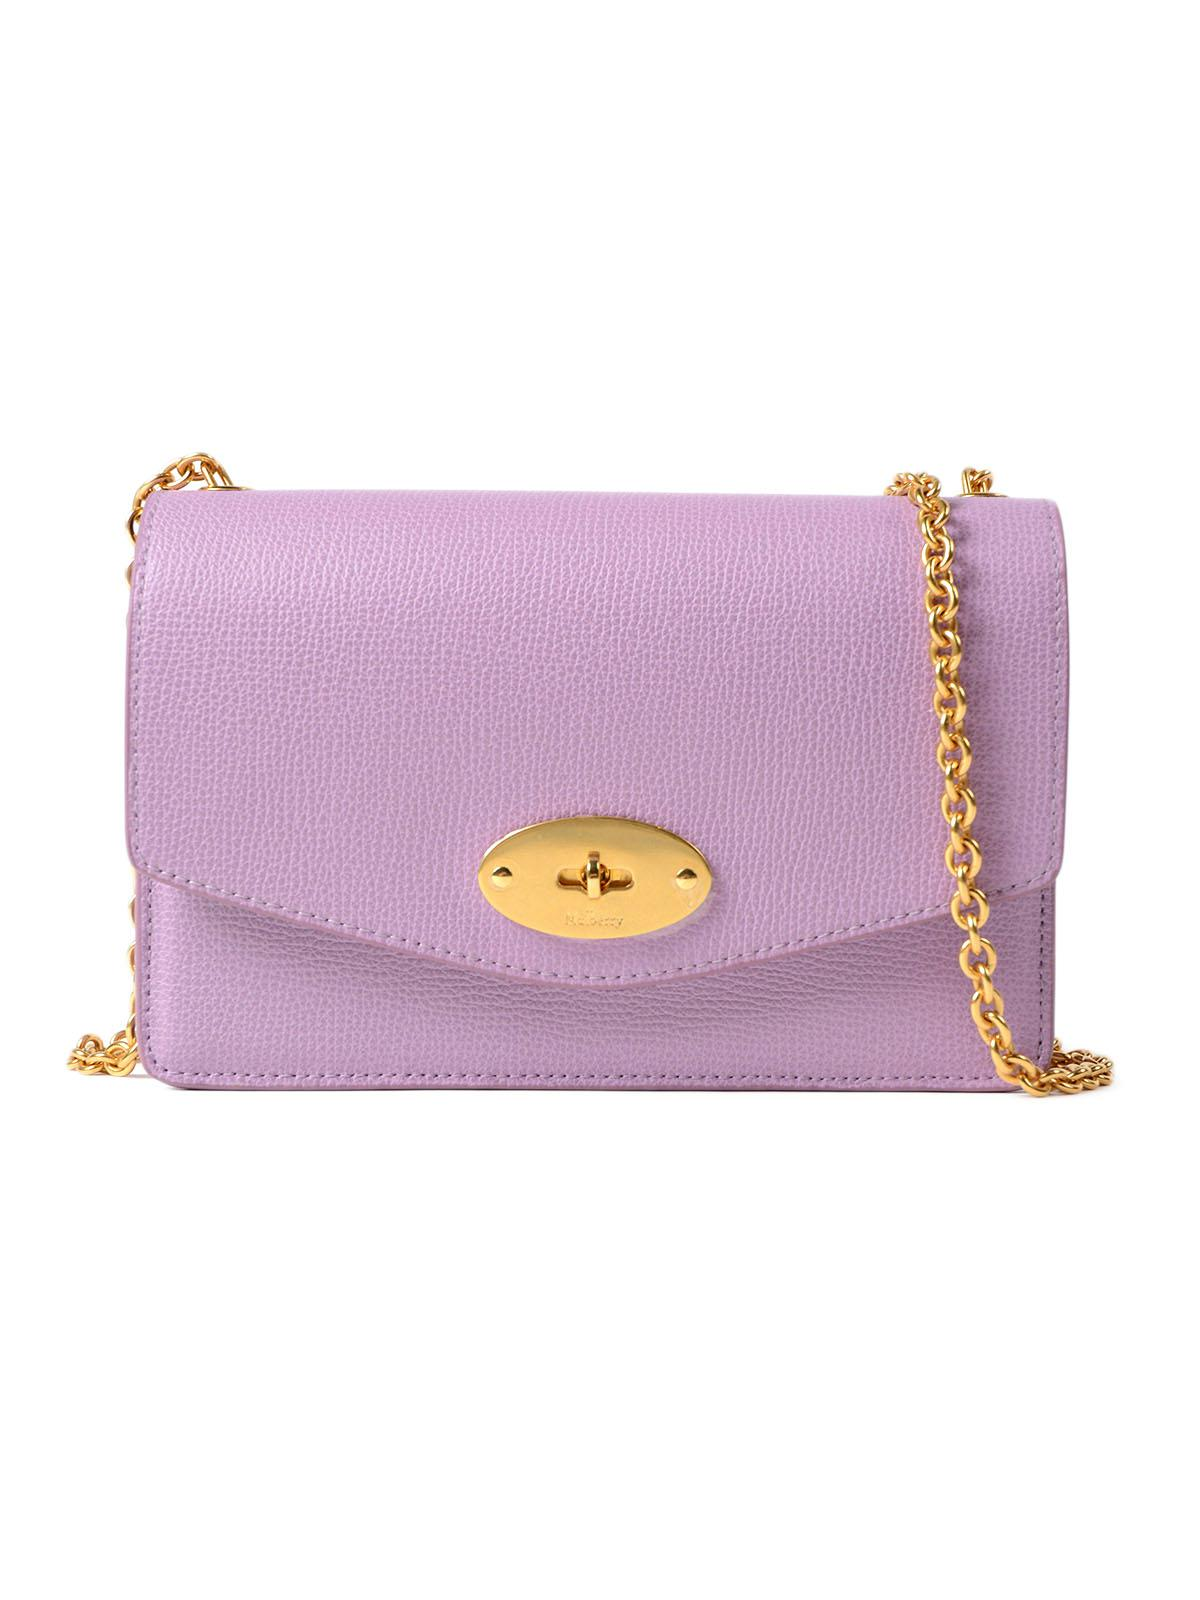 33b2e4f83a Mulberry Small Darley Bag in Purple - Lyst